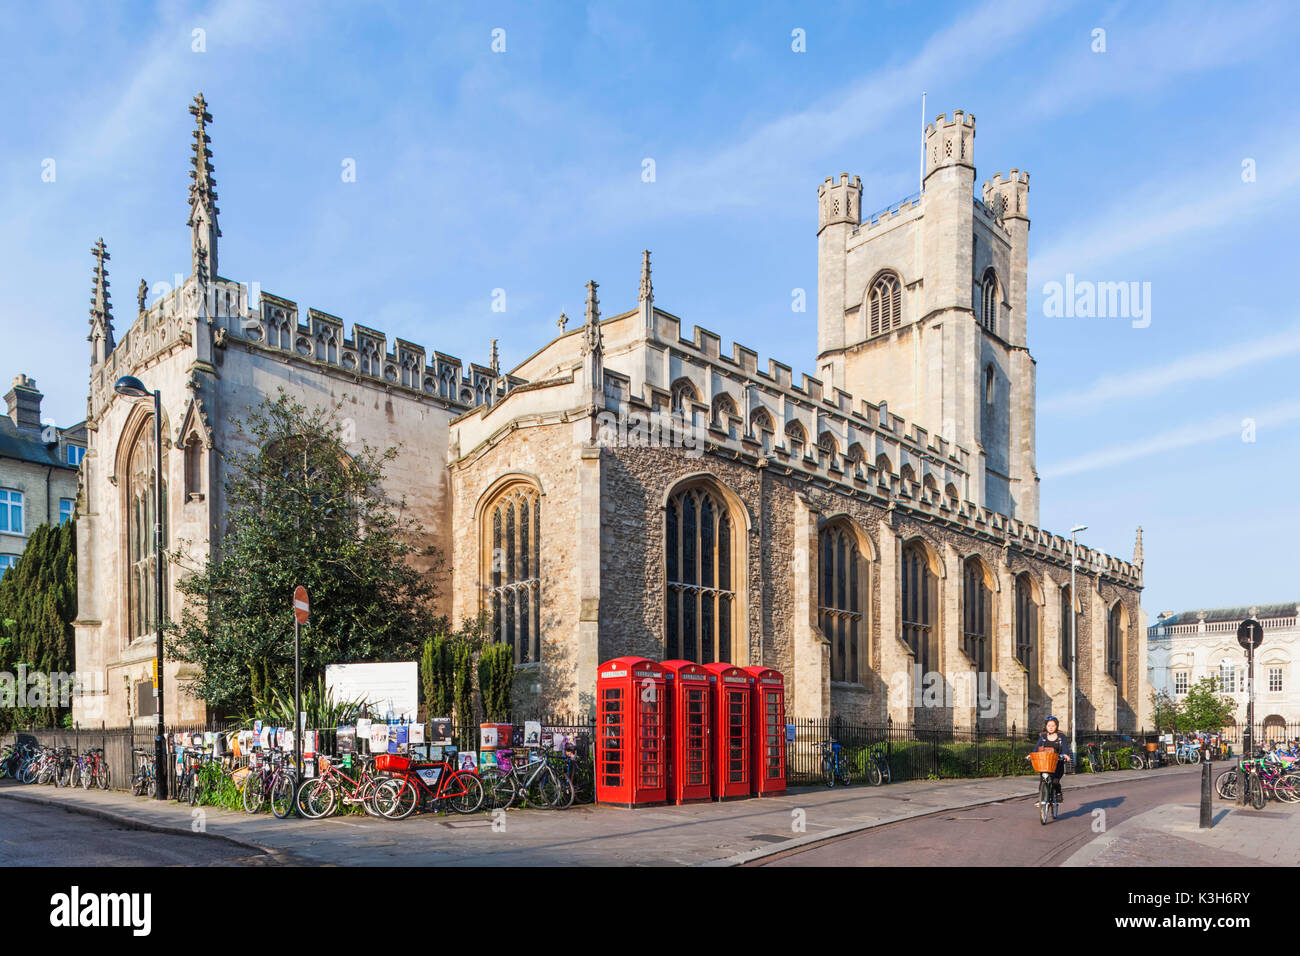 England, Cambridgeshire, Cambridge, Old Great St.Mary's Church - Stock Image